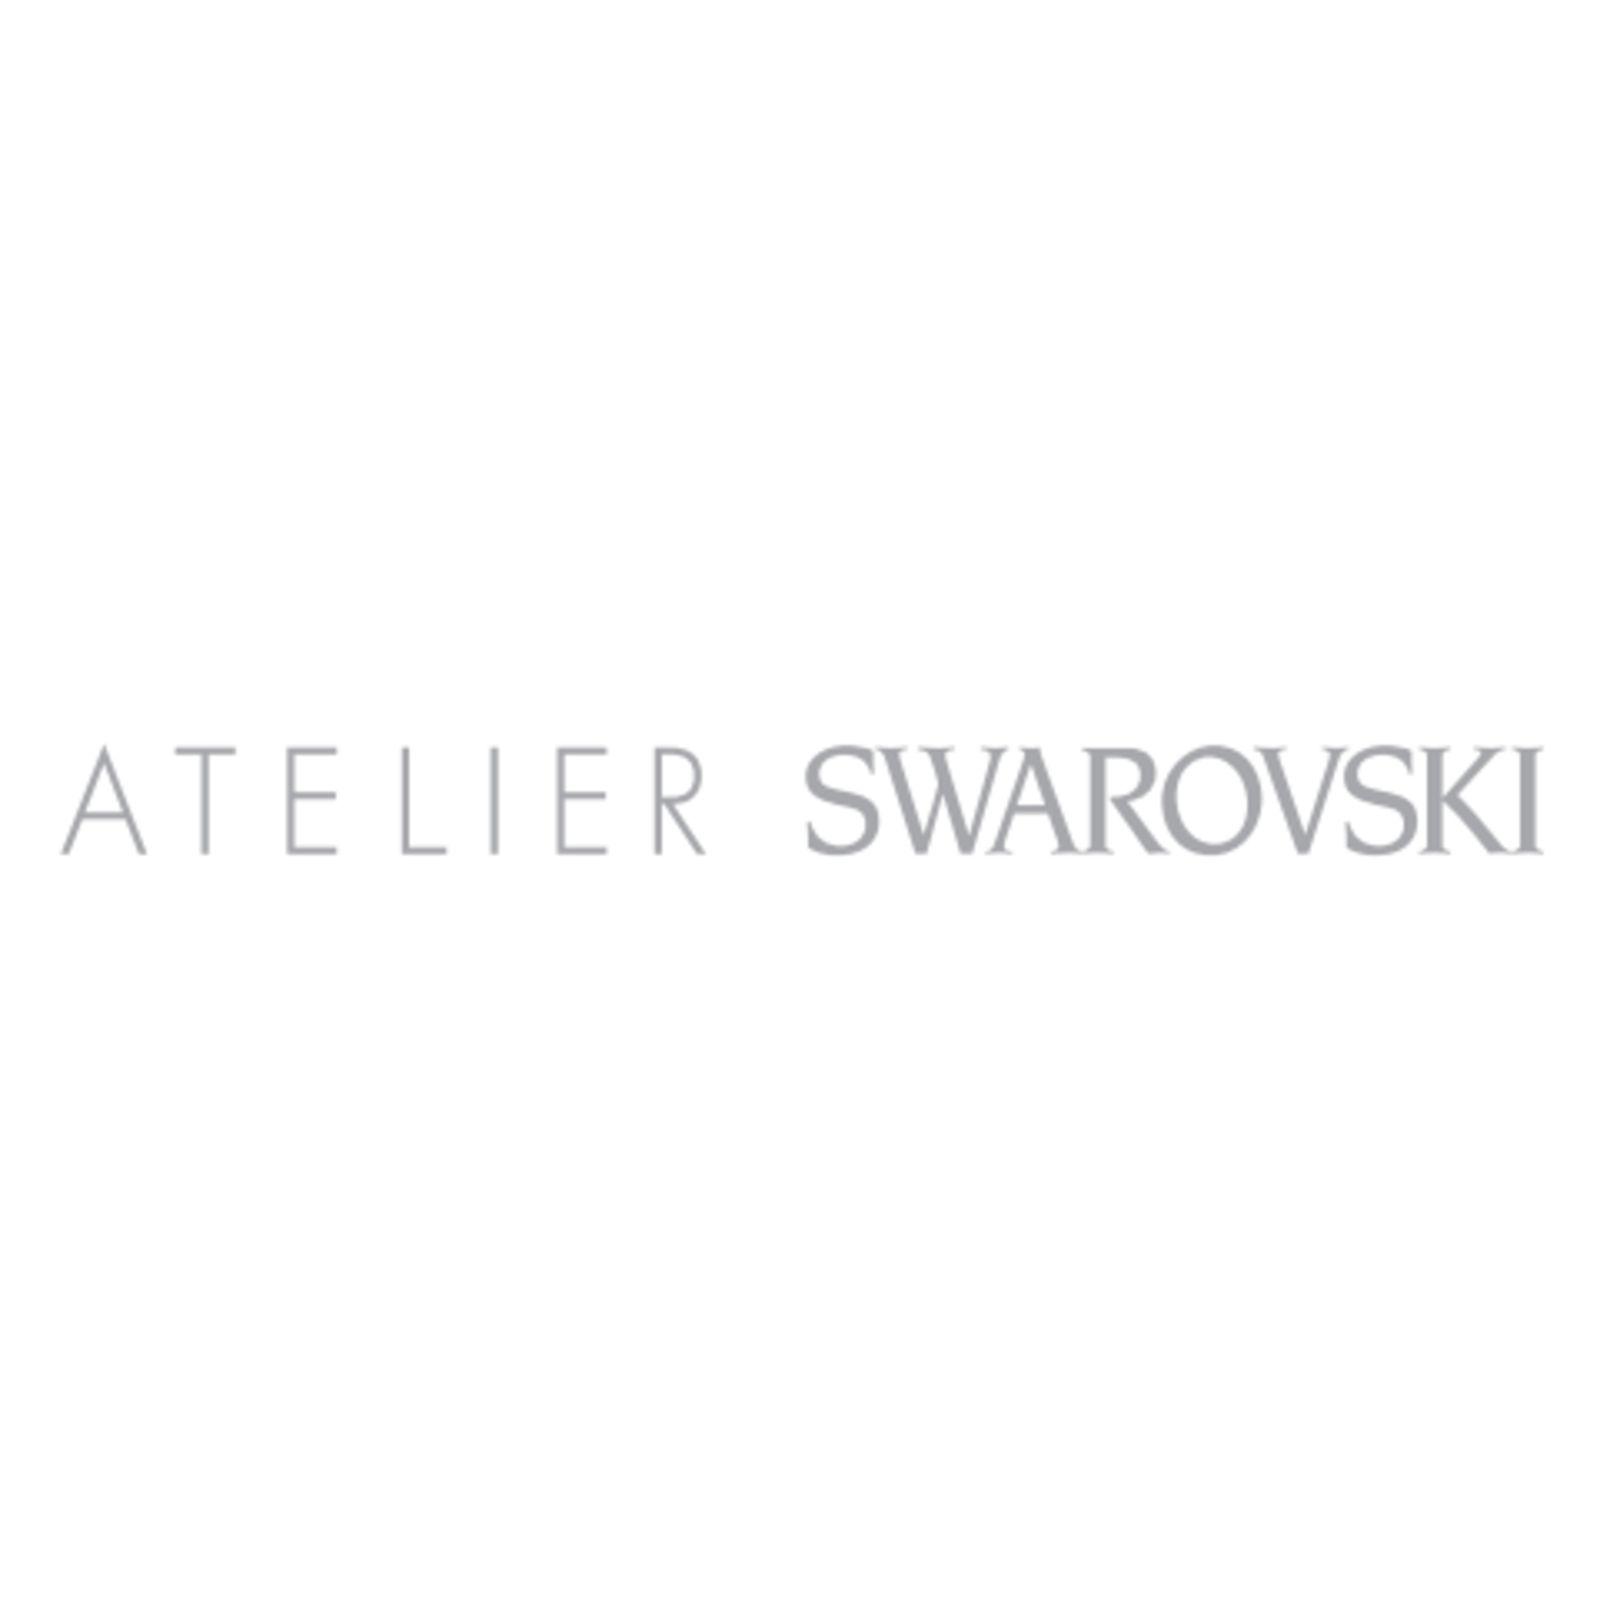 ATELIER SWAROVSKI (Image 1)